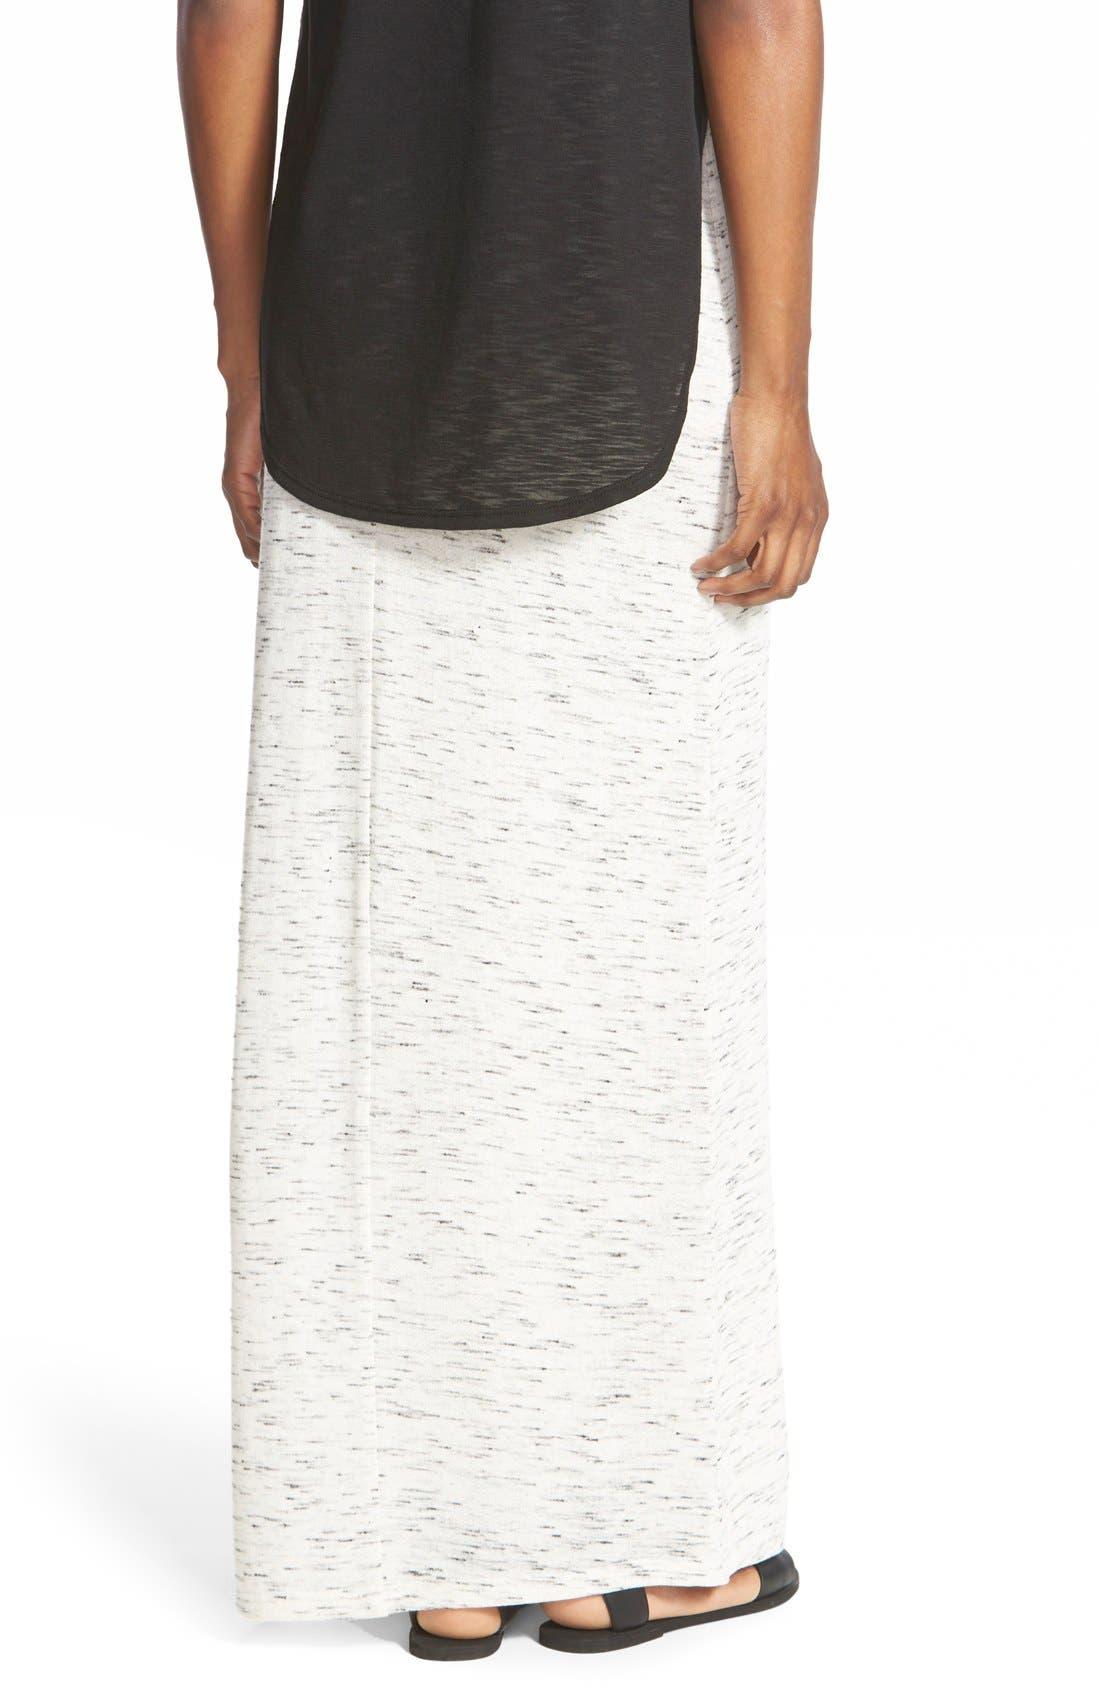 Alternate Image 2  - The Hanger Heathered Knit Maxi Skirt (Juniors)